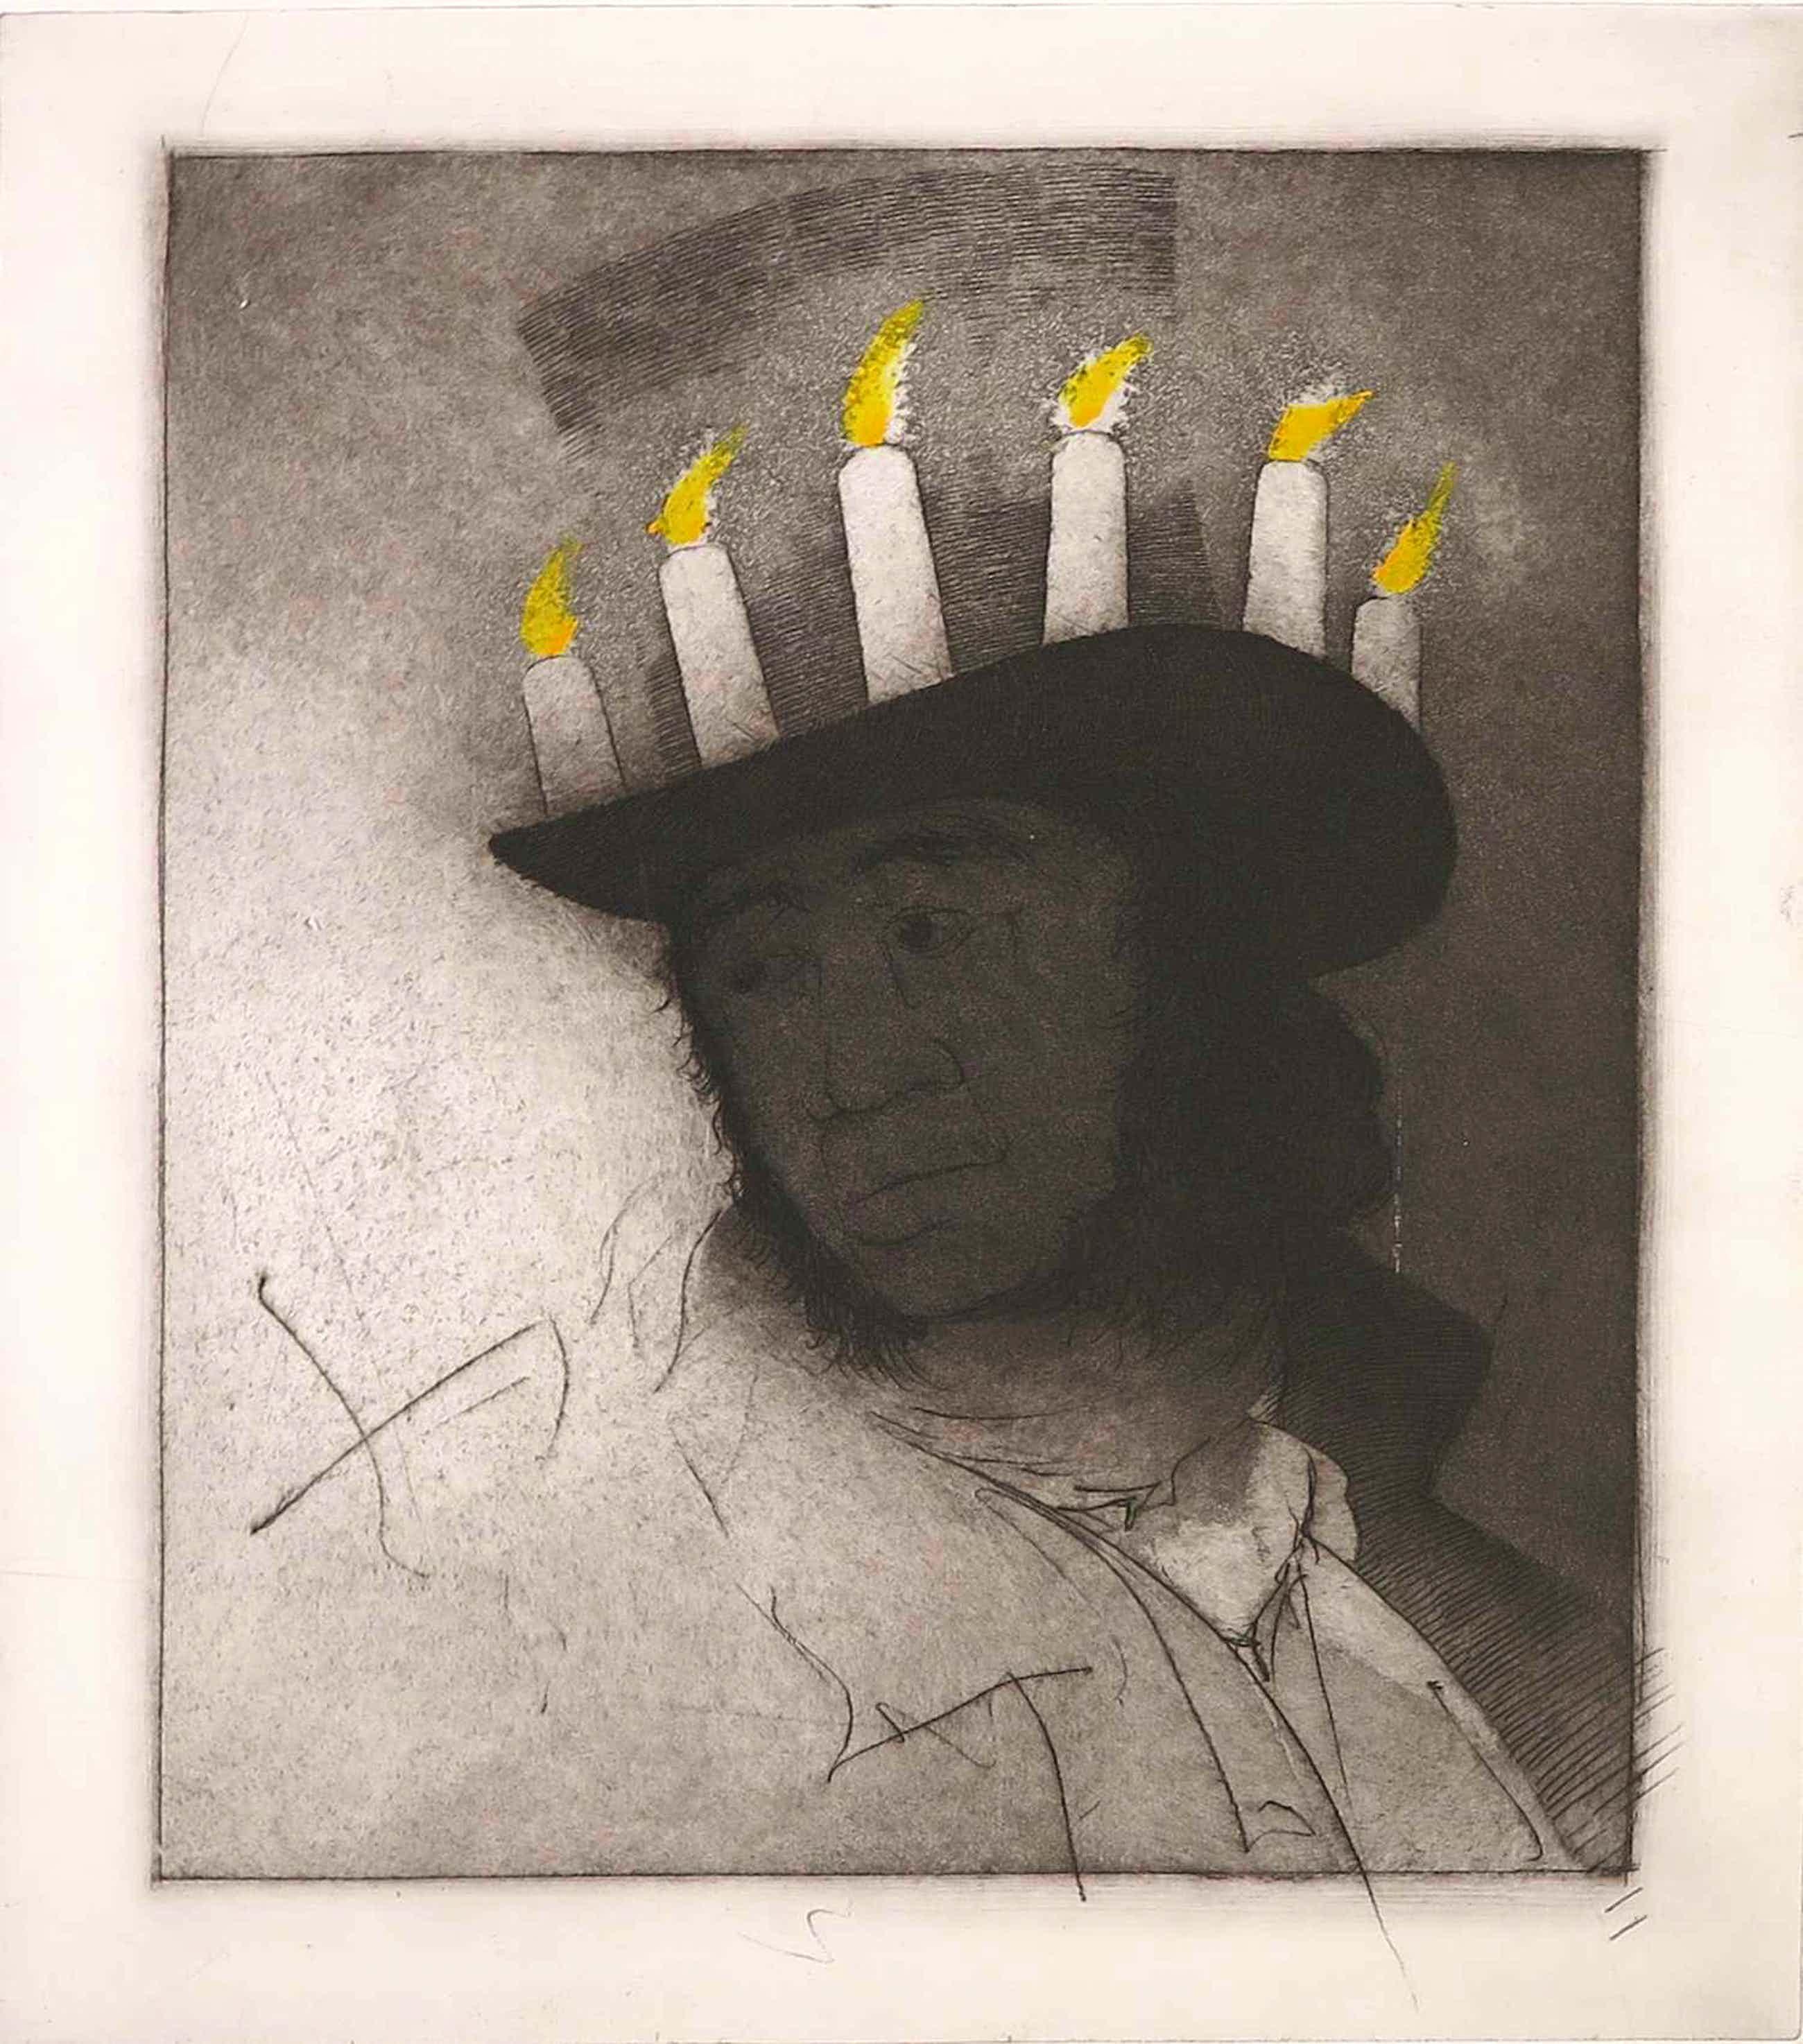 Ronald Tolman - Ets, Goya kopen? Bied vanaf 50!